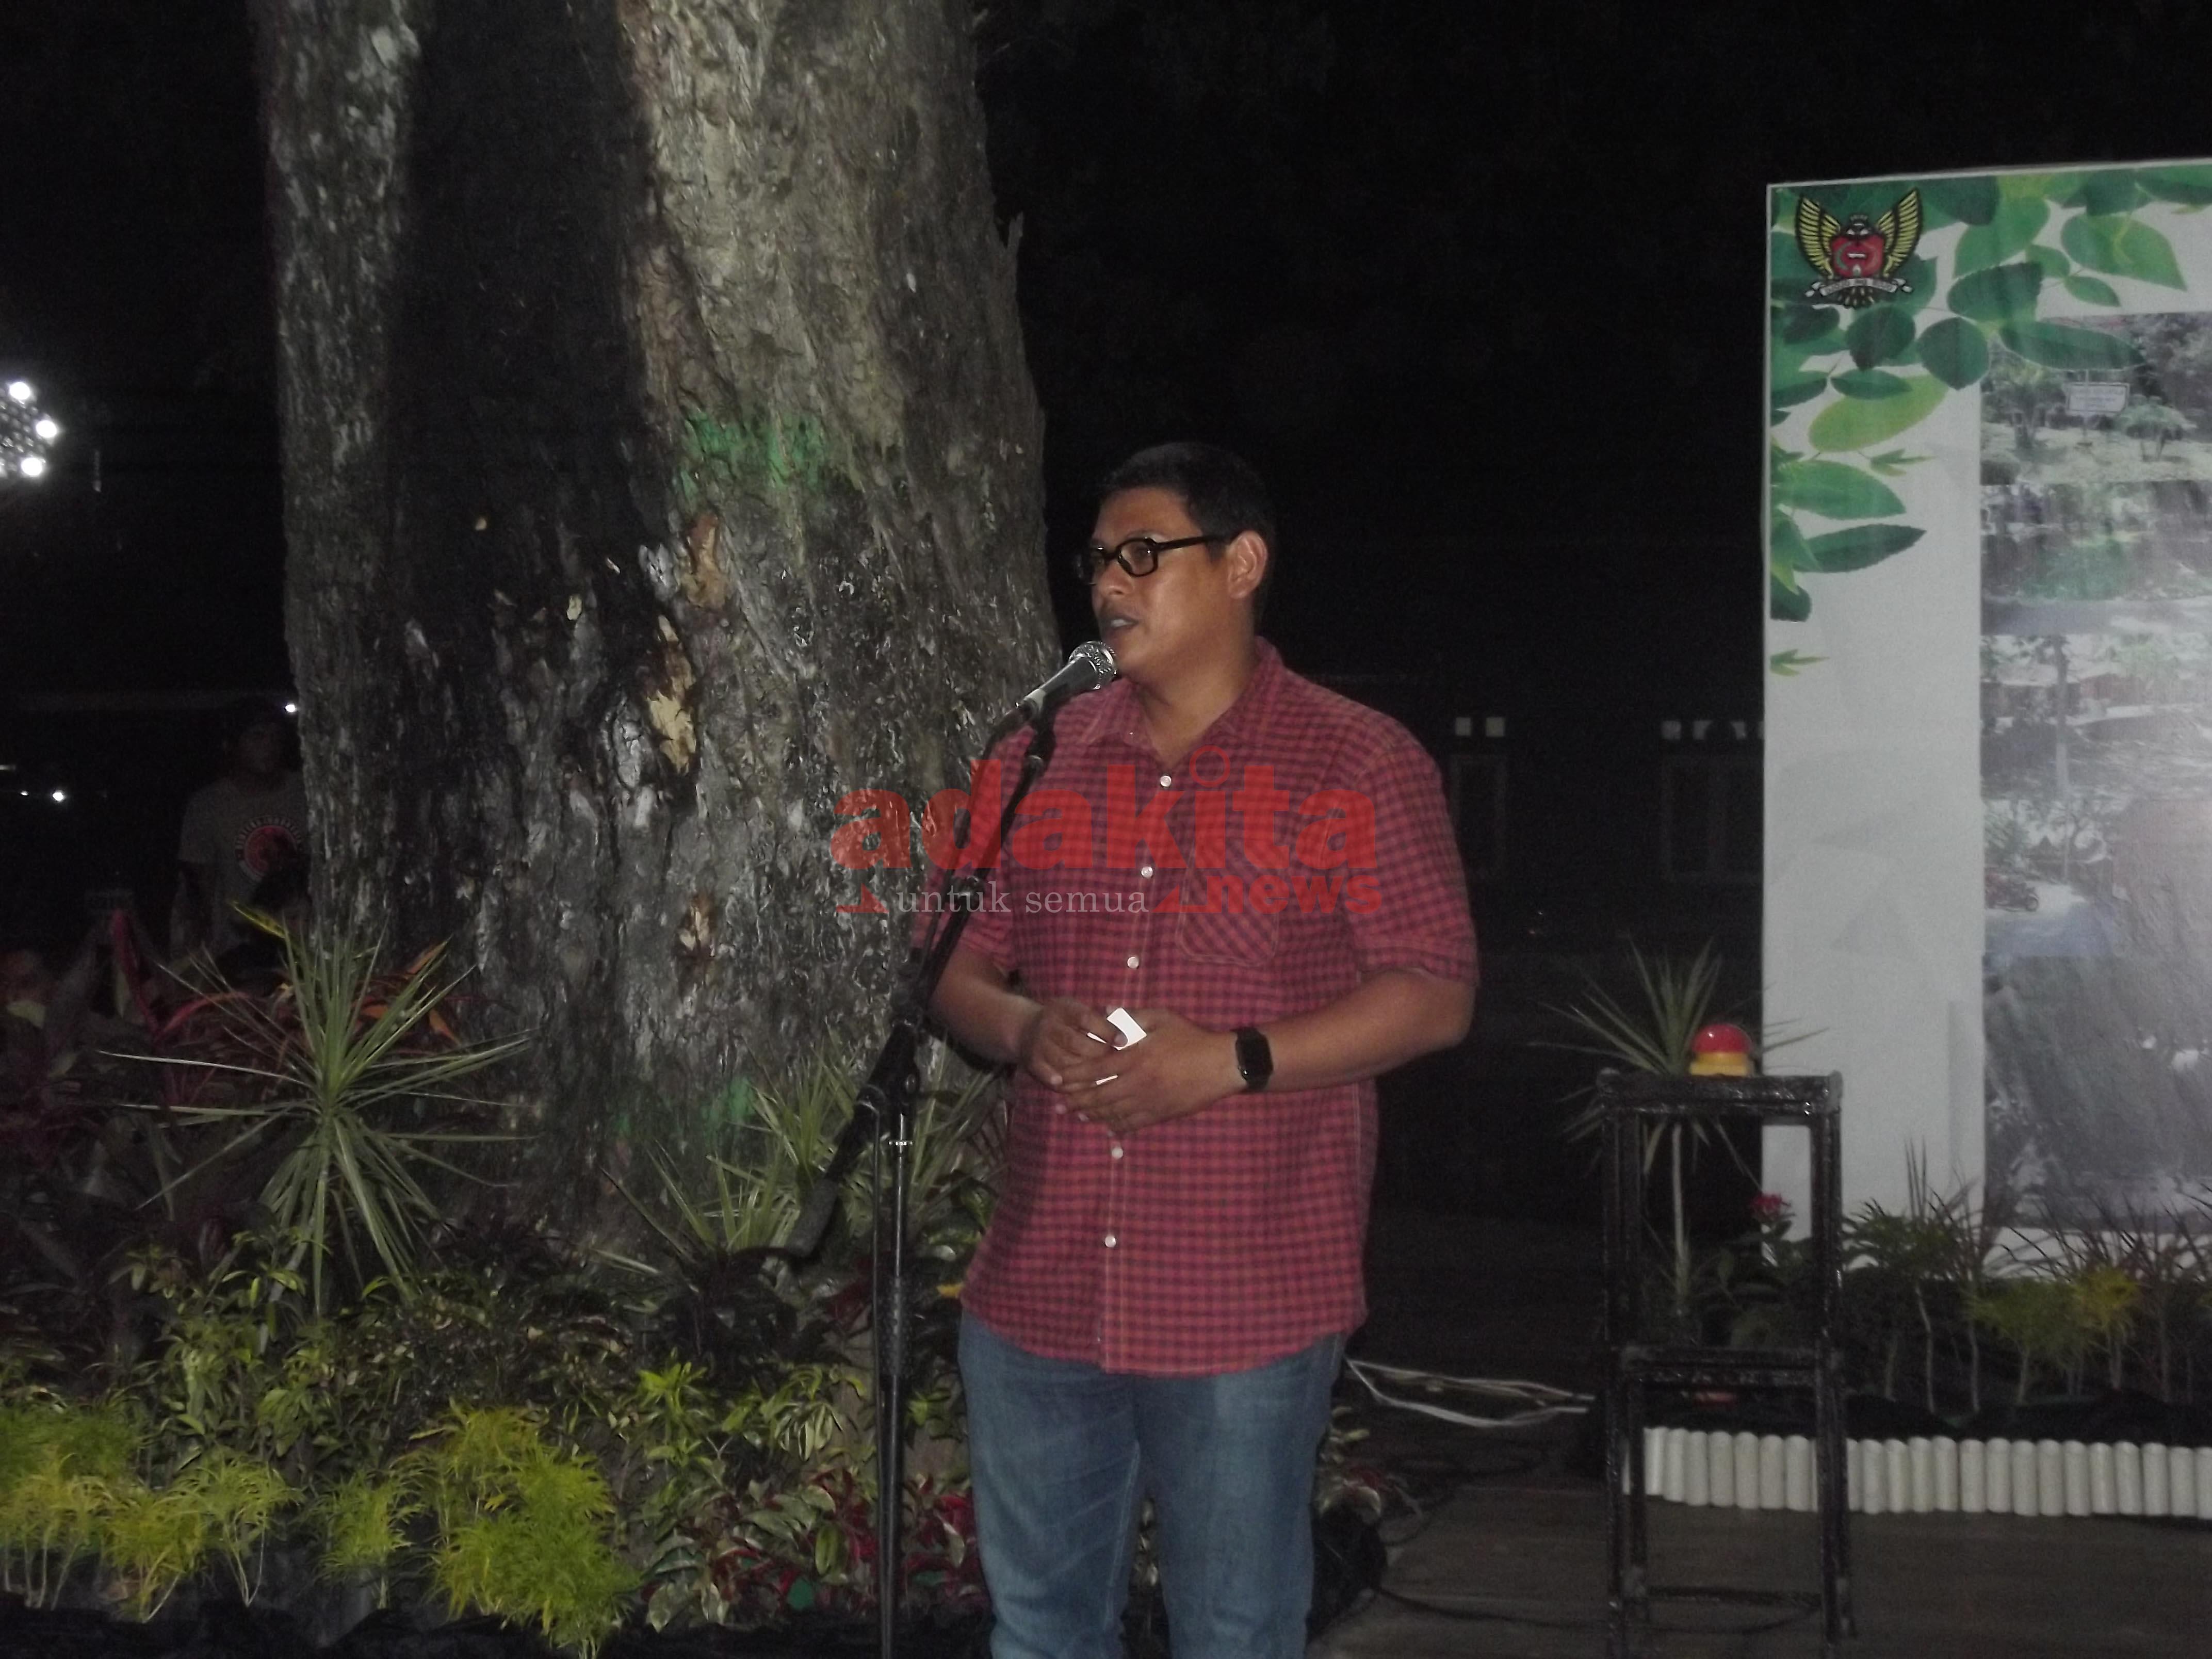 Taman Sekartaji Asap Rokok Adakitanews Kota Kediri Walikota Kab